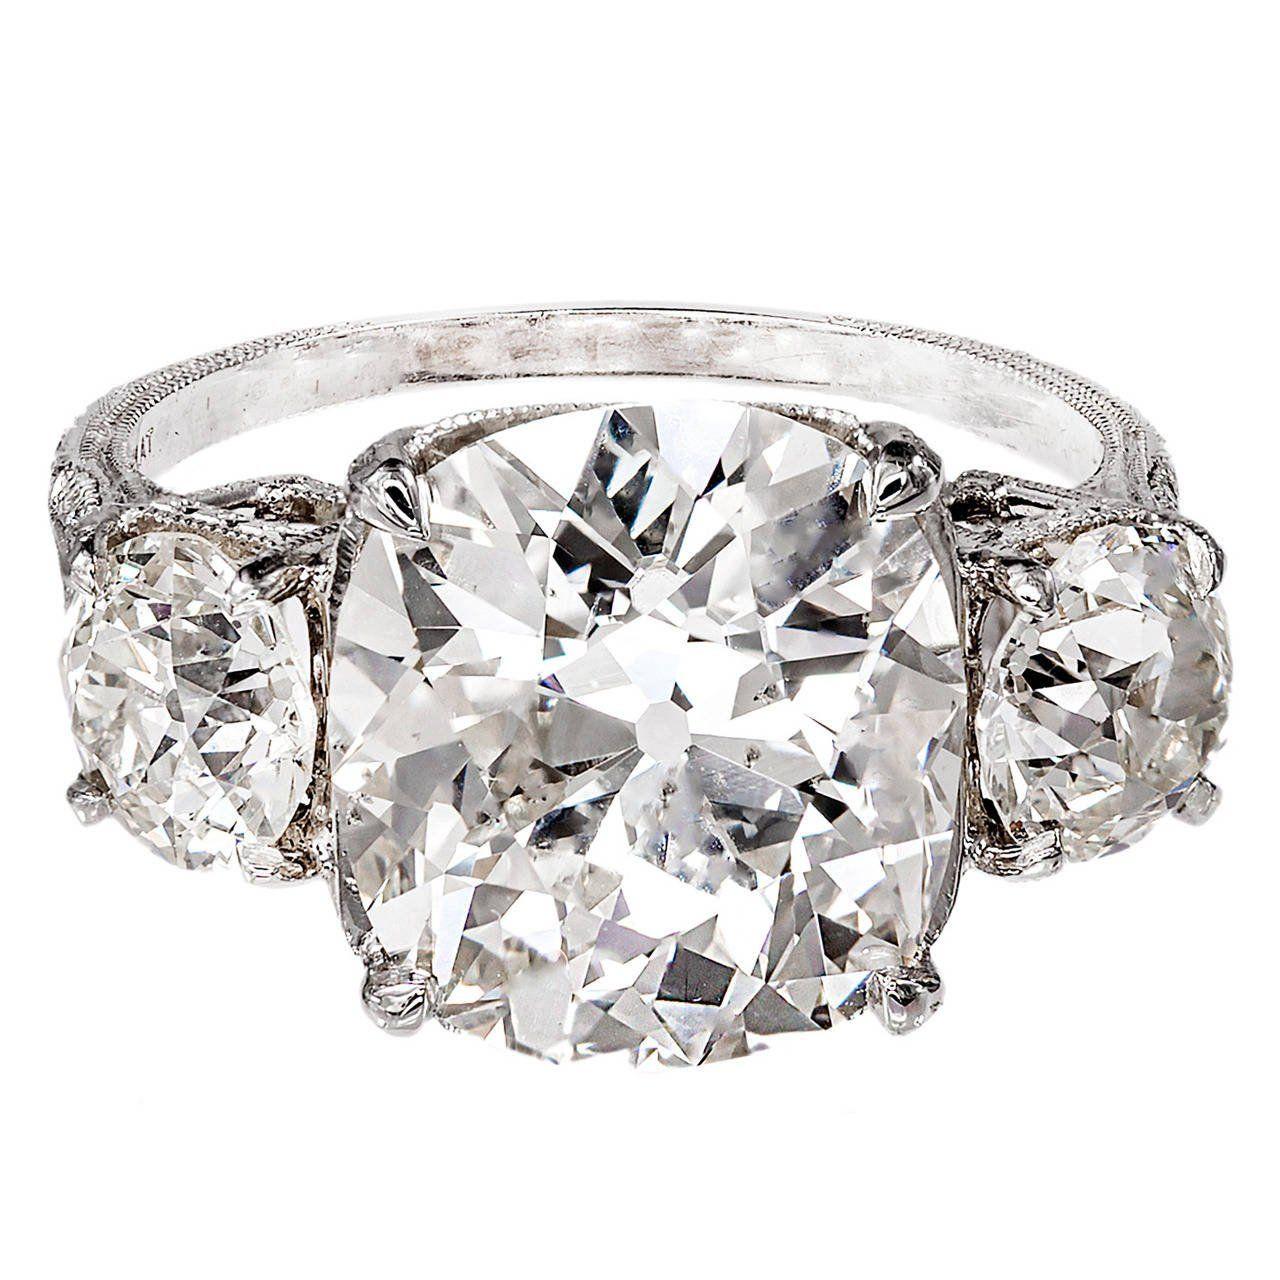 Pin on Drop Dead Diamond Rocks 4 Me Thank U